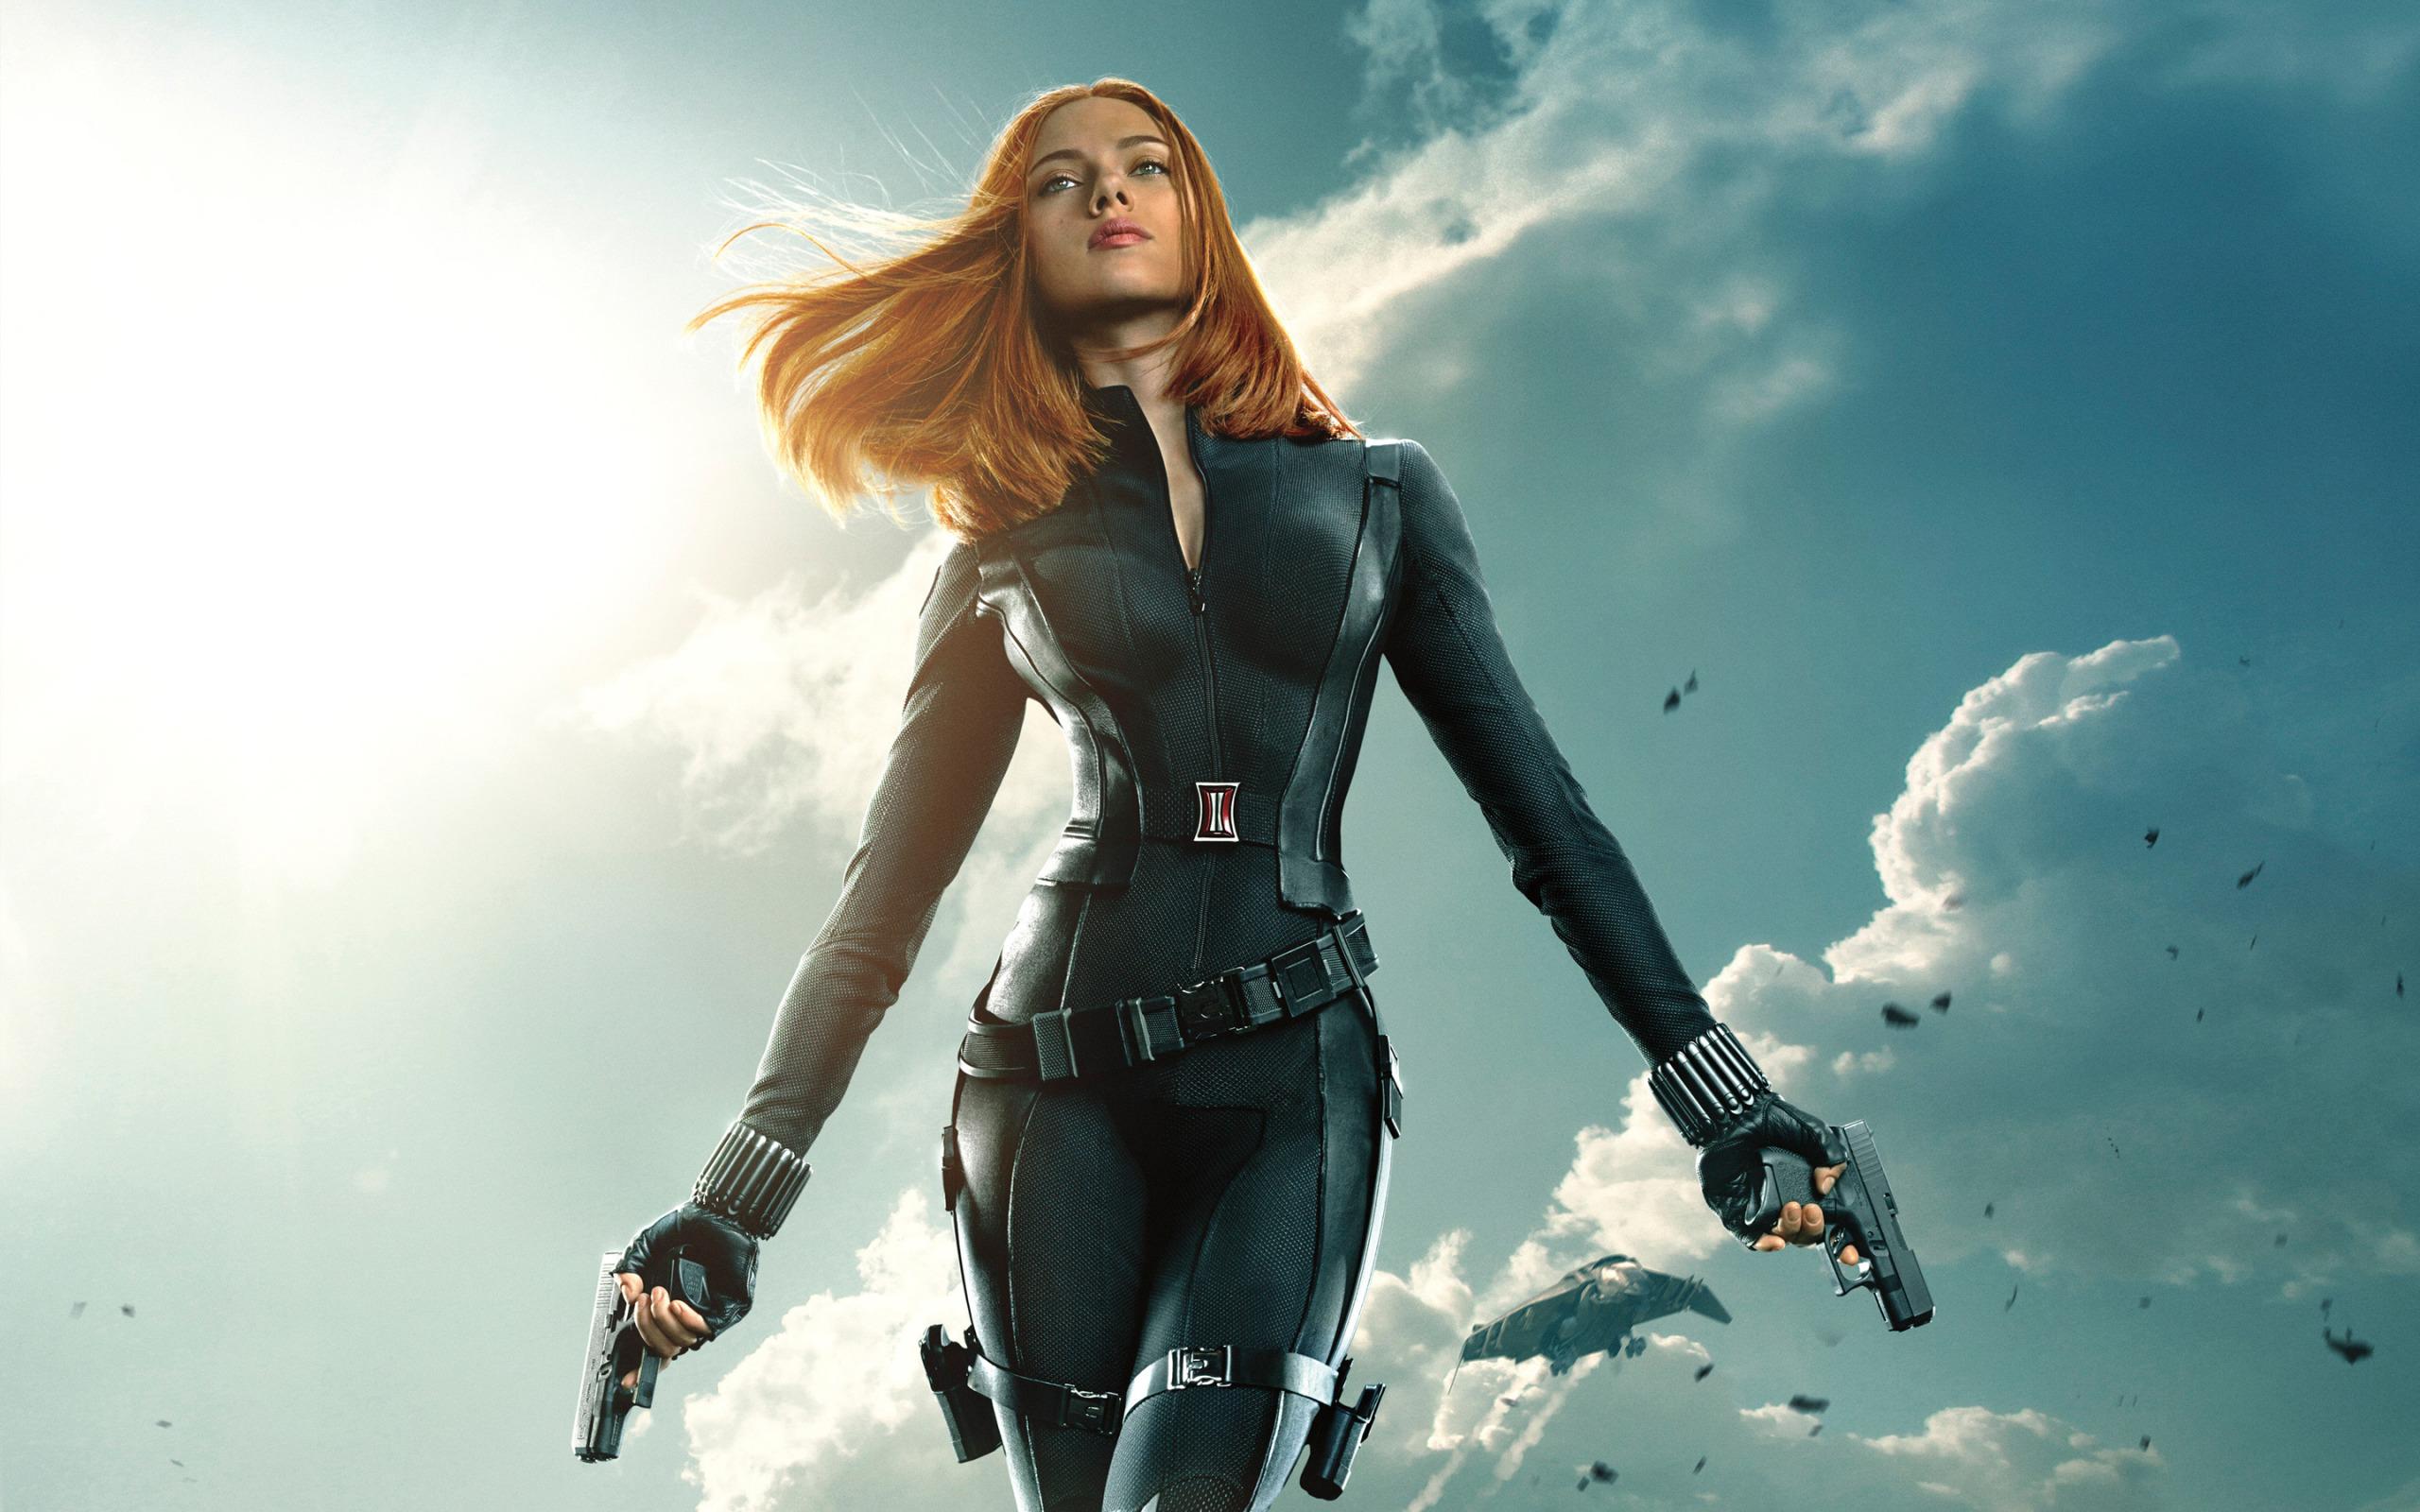 Fondos De Pantalla Viuda Negra Scarlett Johansson